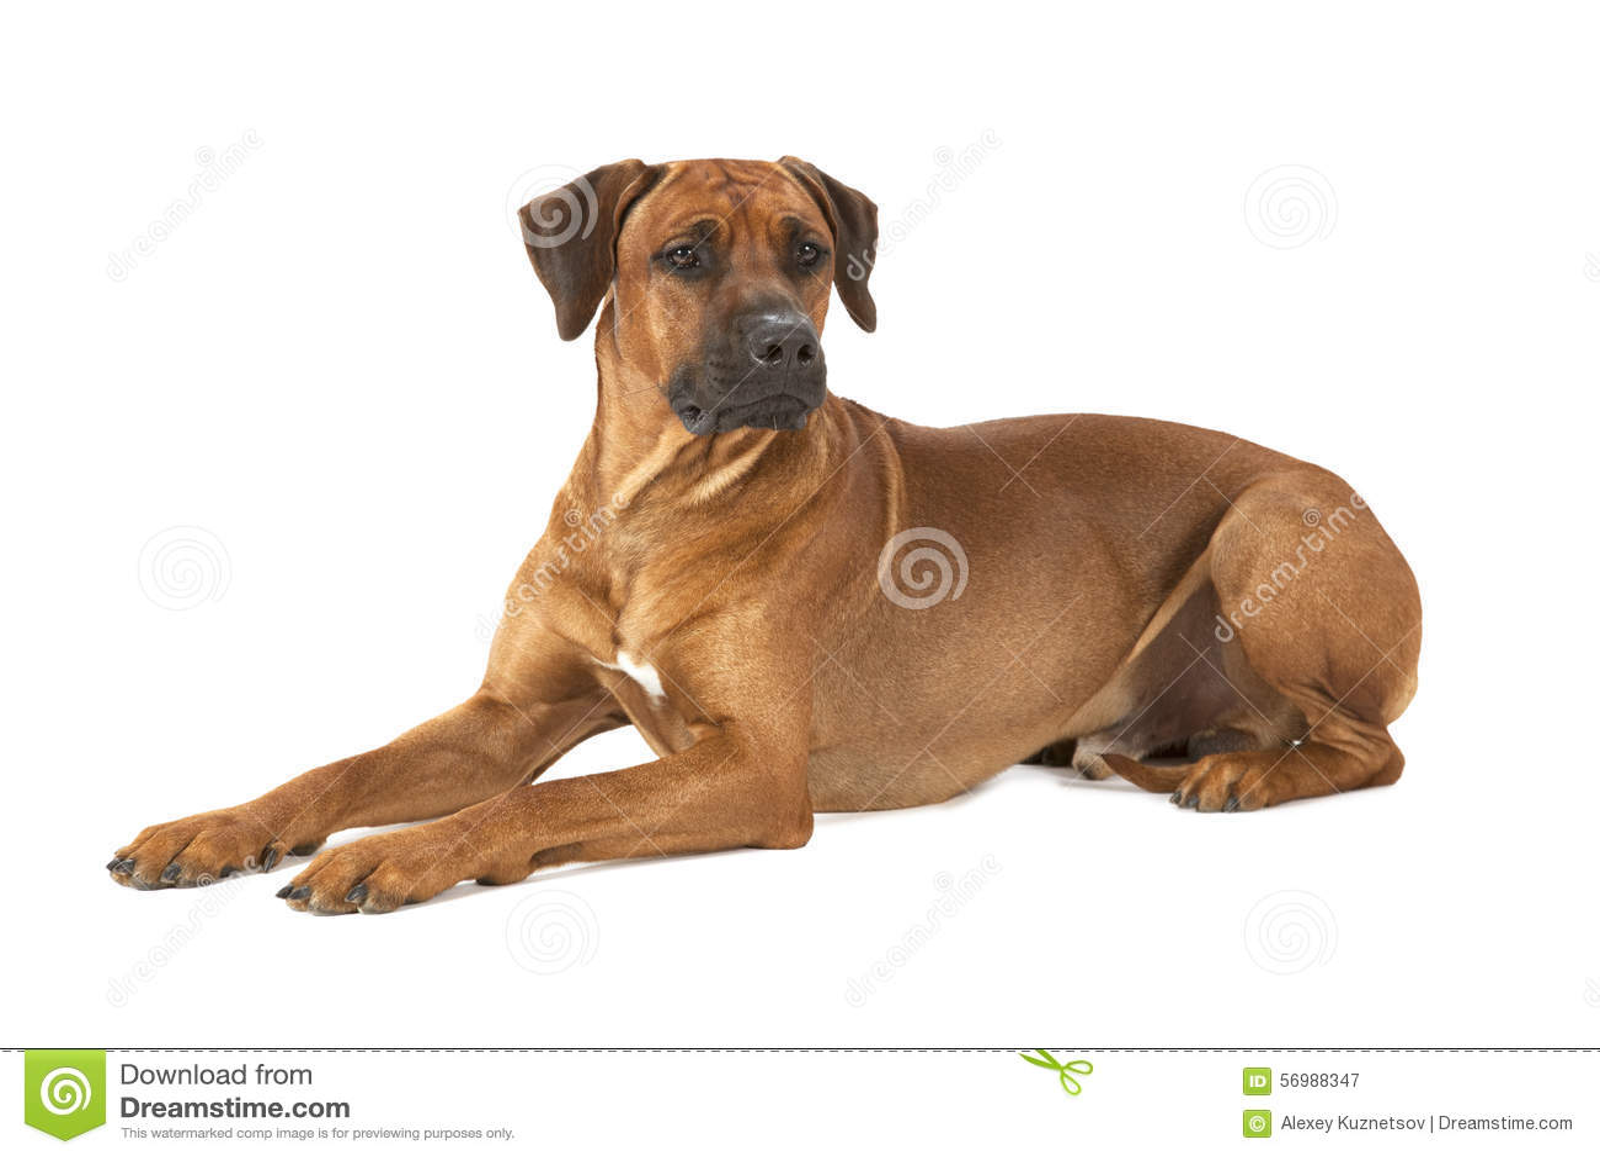 Rhodesian Ridgeback dog on a white background